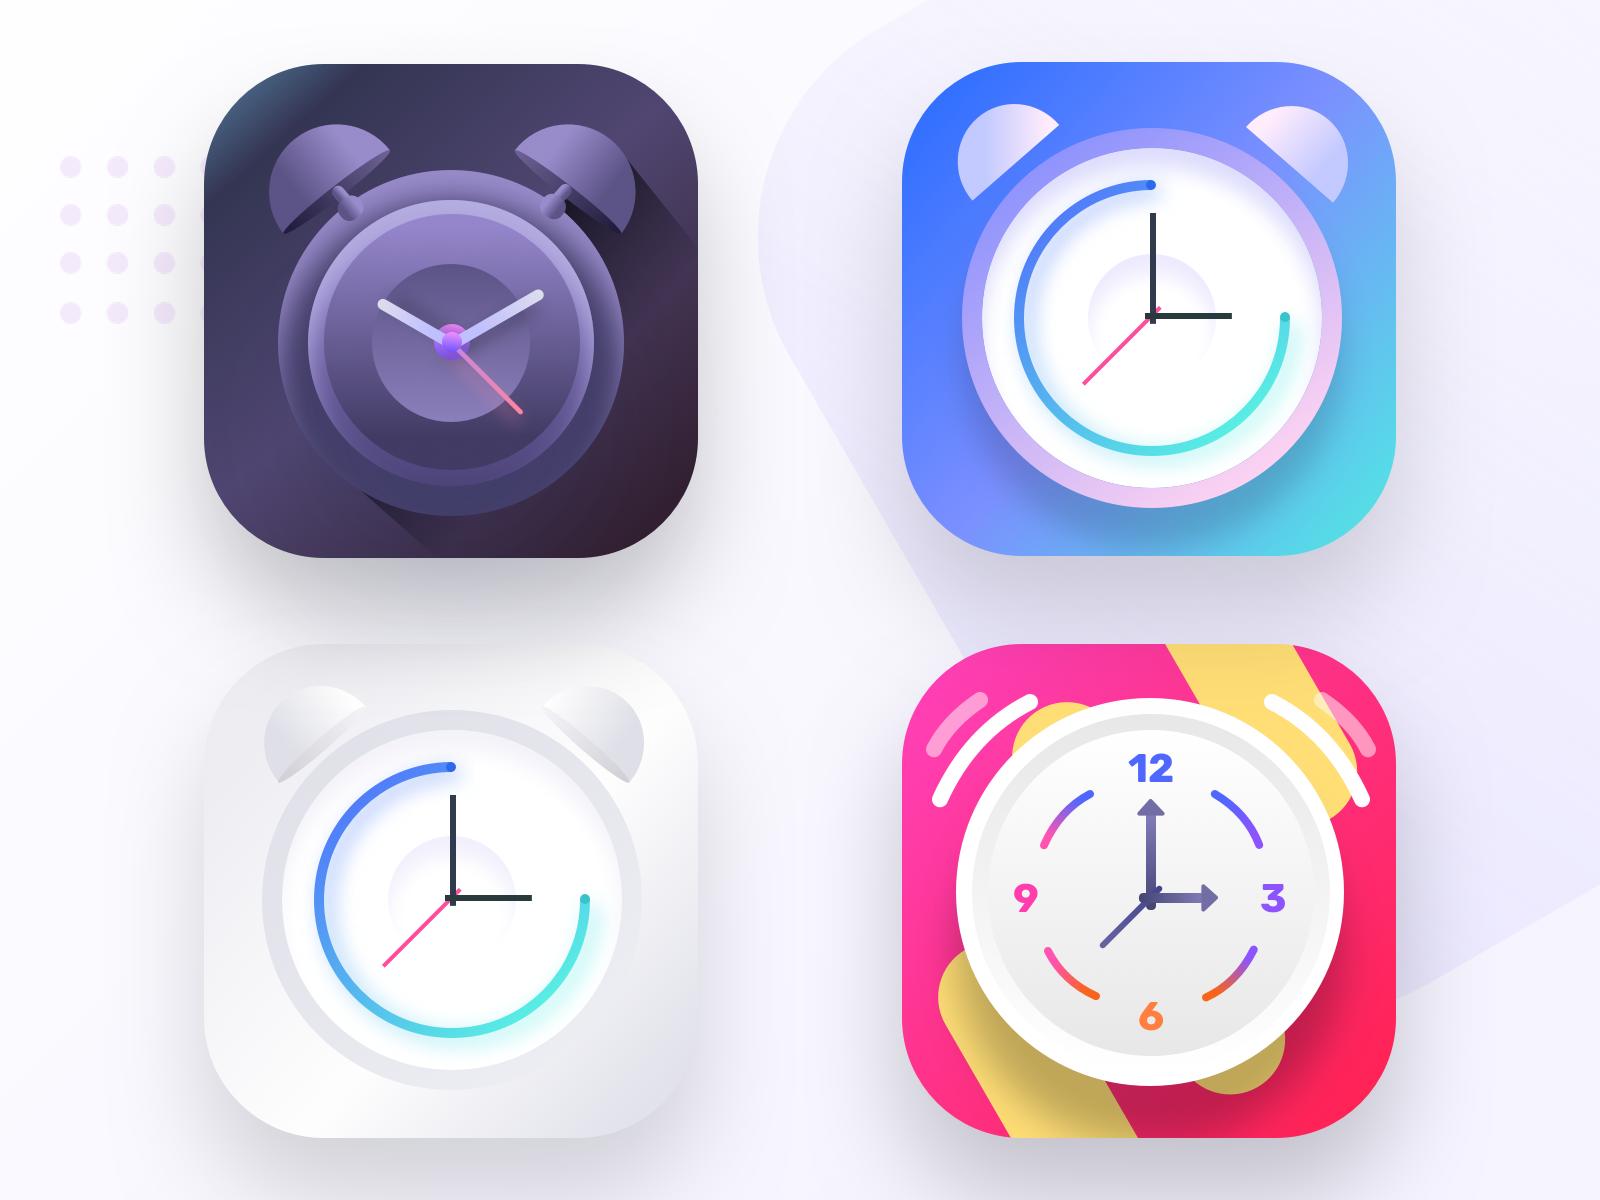 Alarm clock app icons part 2 by Prakhar Neel Sharma